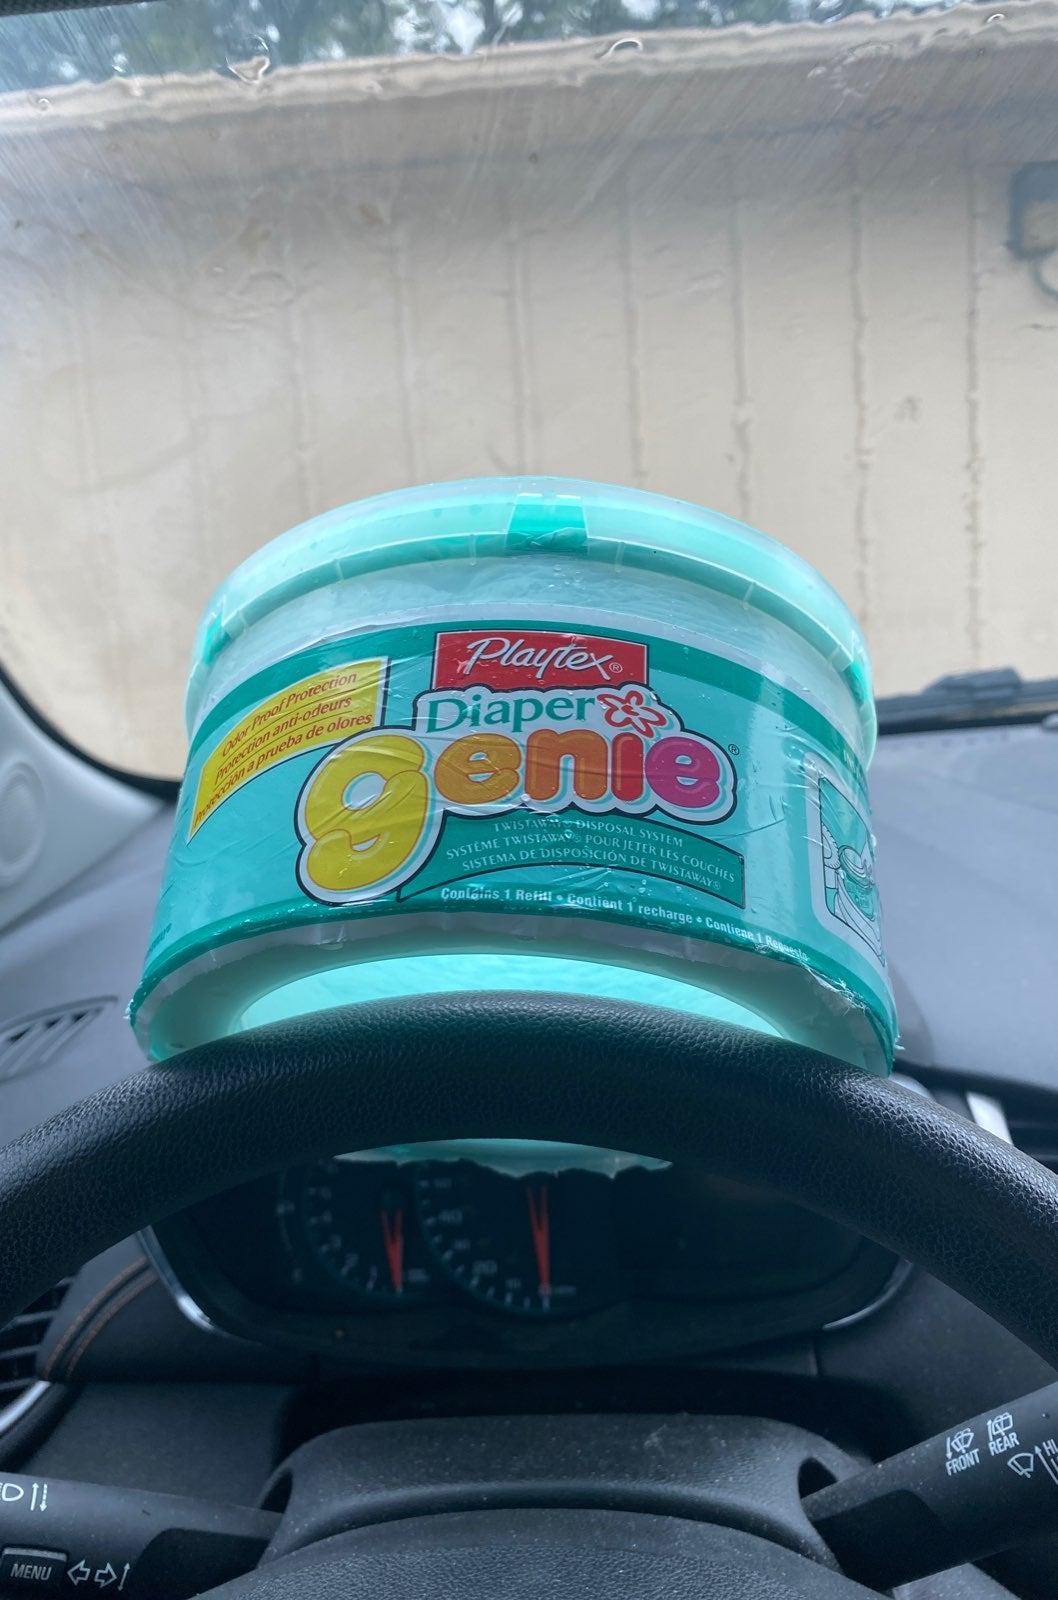 Diaper genie bags!